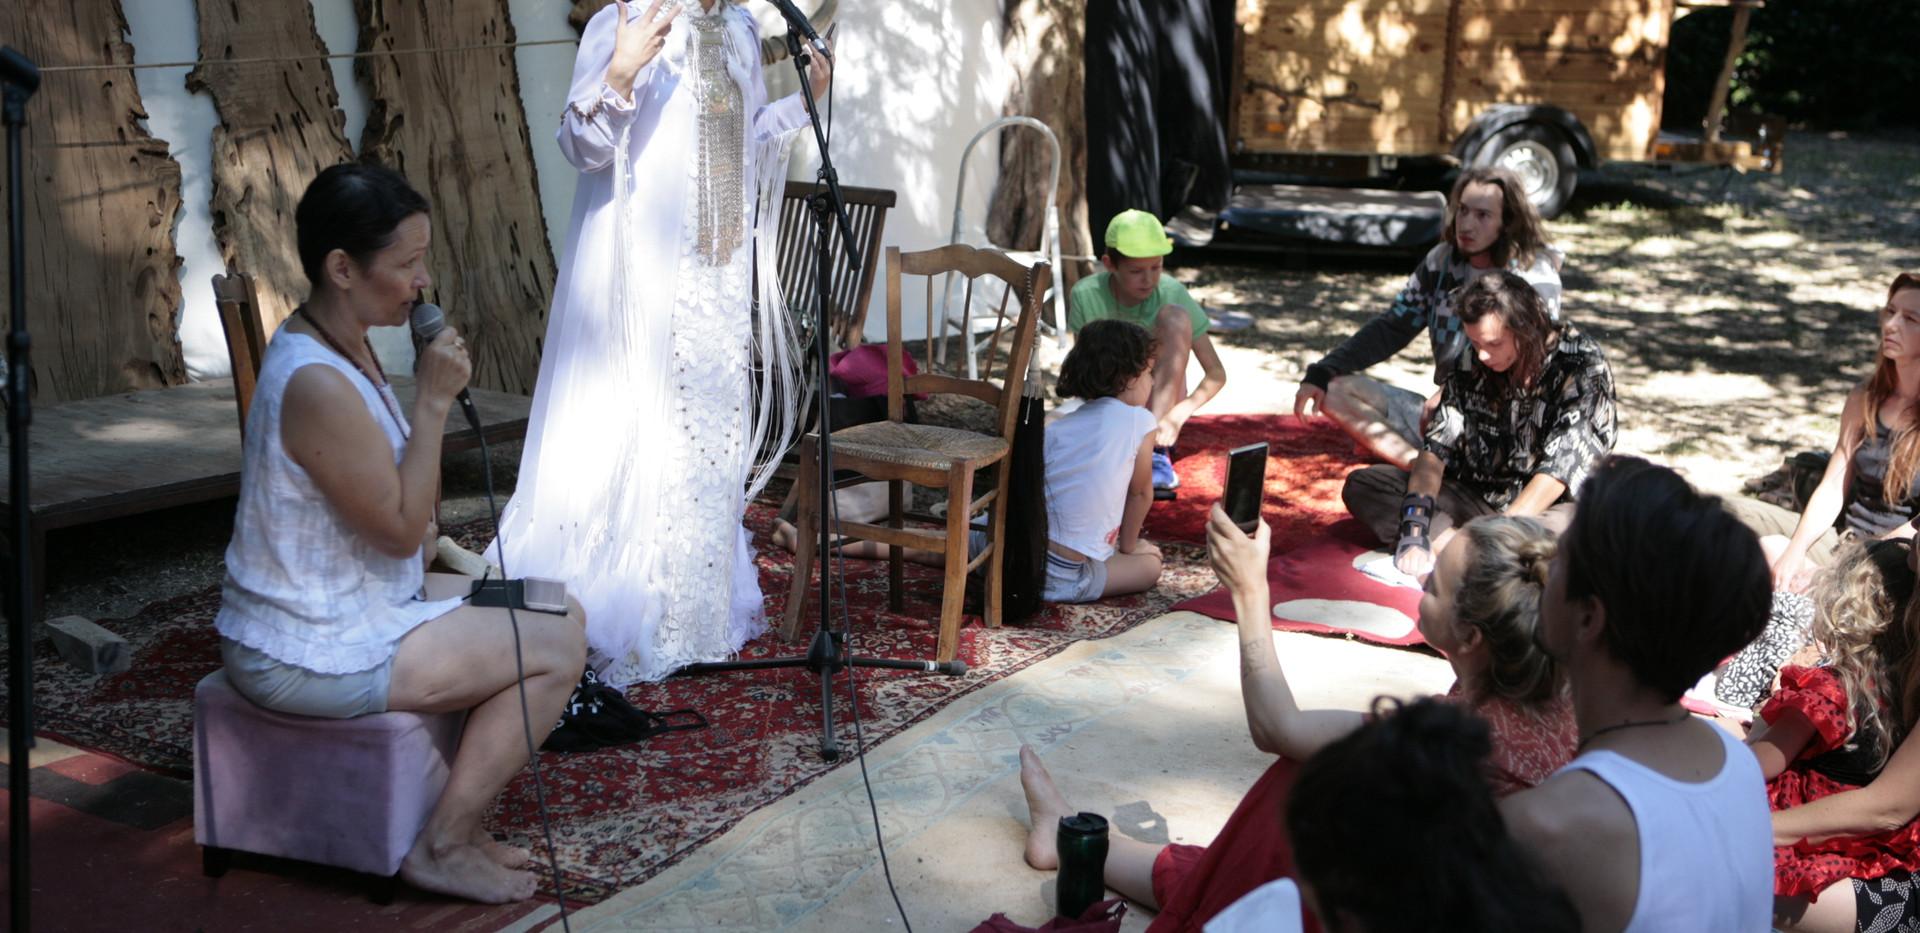 Atelier de chant avec Olena Uutaï